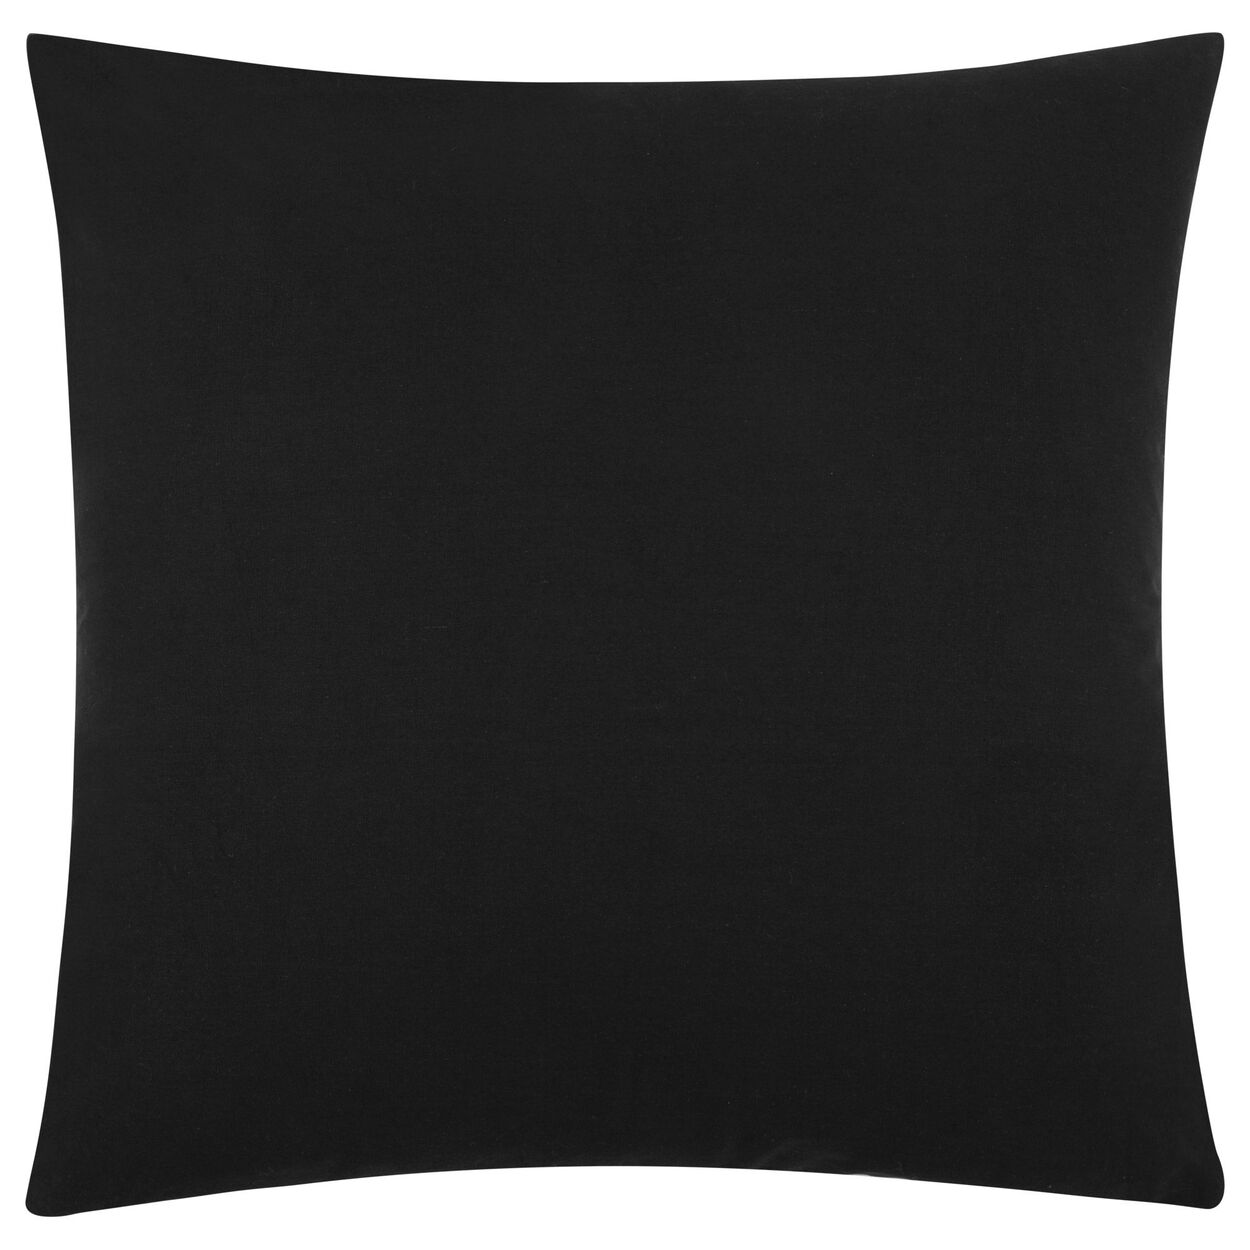 "Player Decorative Pillow 18"" X 18"""